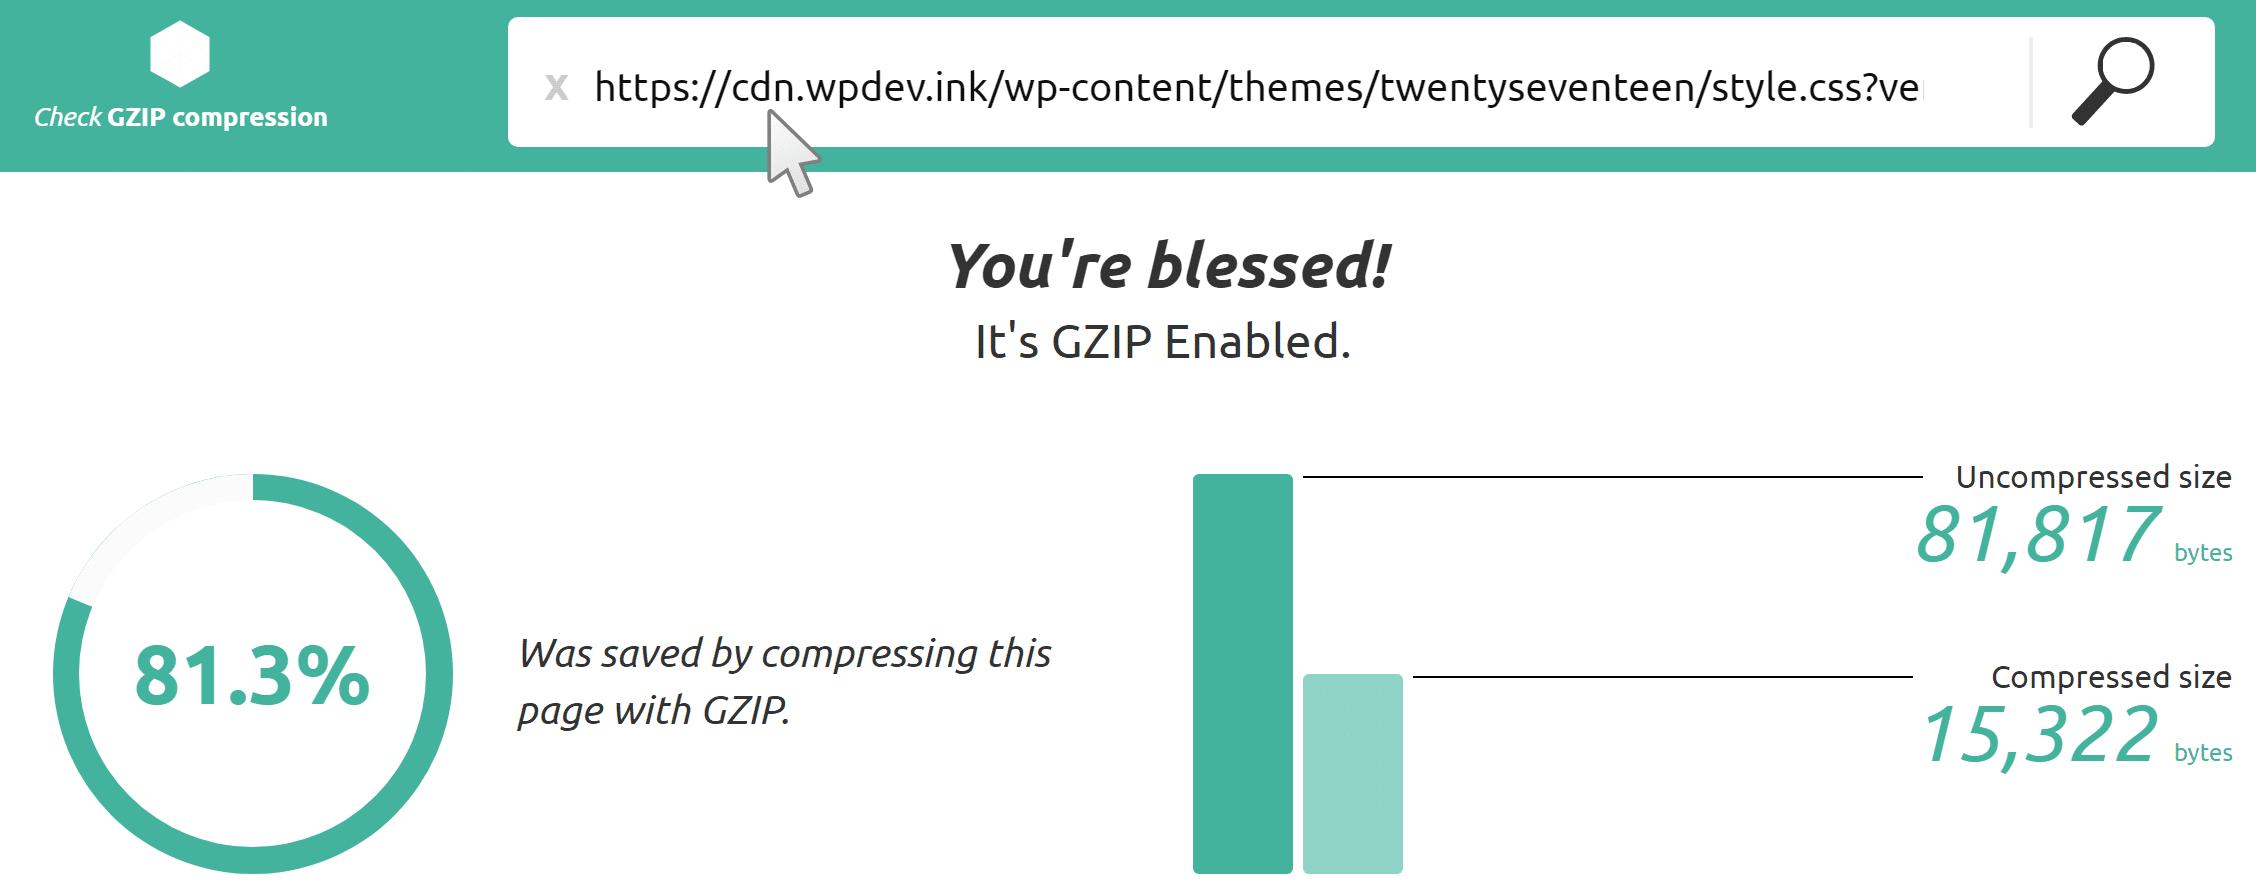 Check GZIP Compression tool met CDN